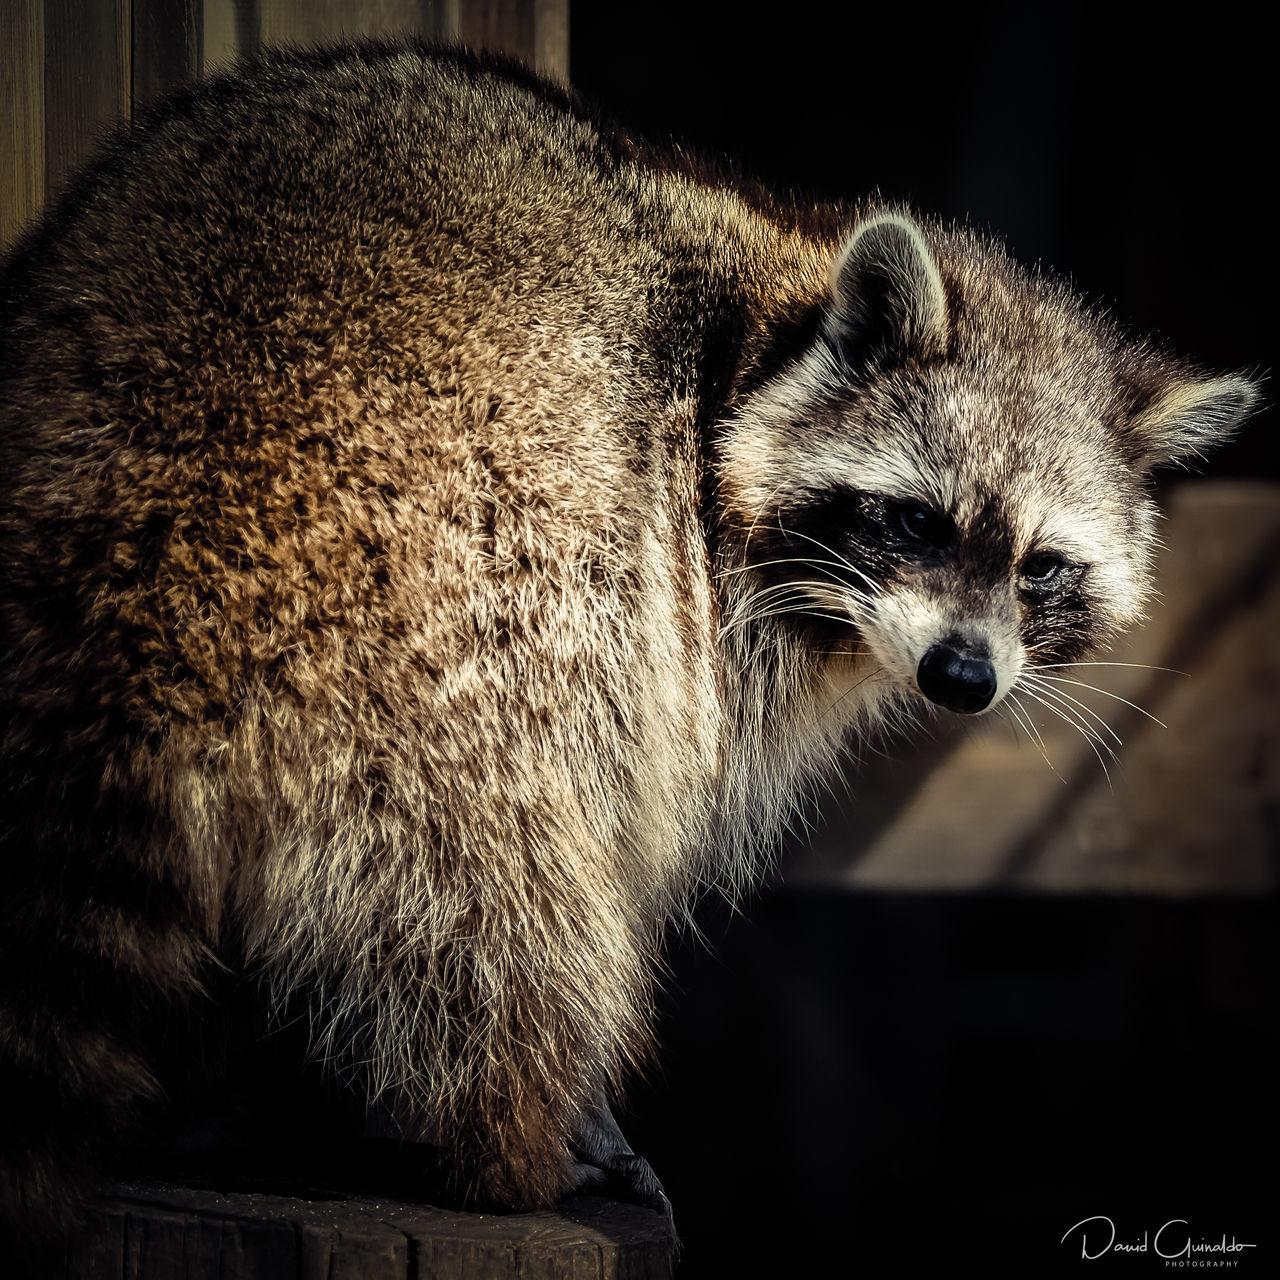 Animal Themes Close-up Mammal No People One Animal Raccoon Zoo